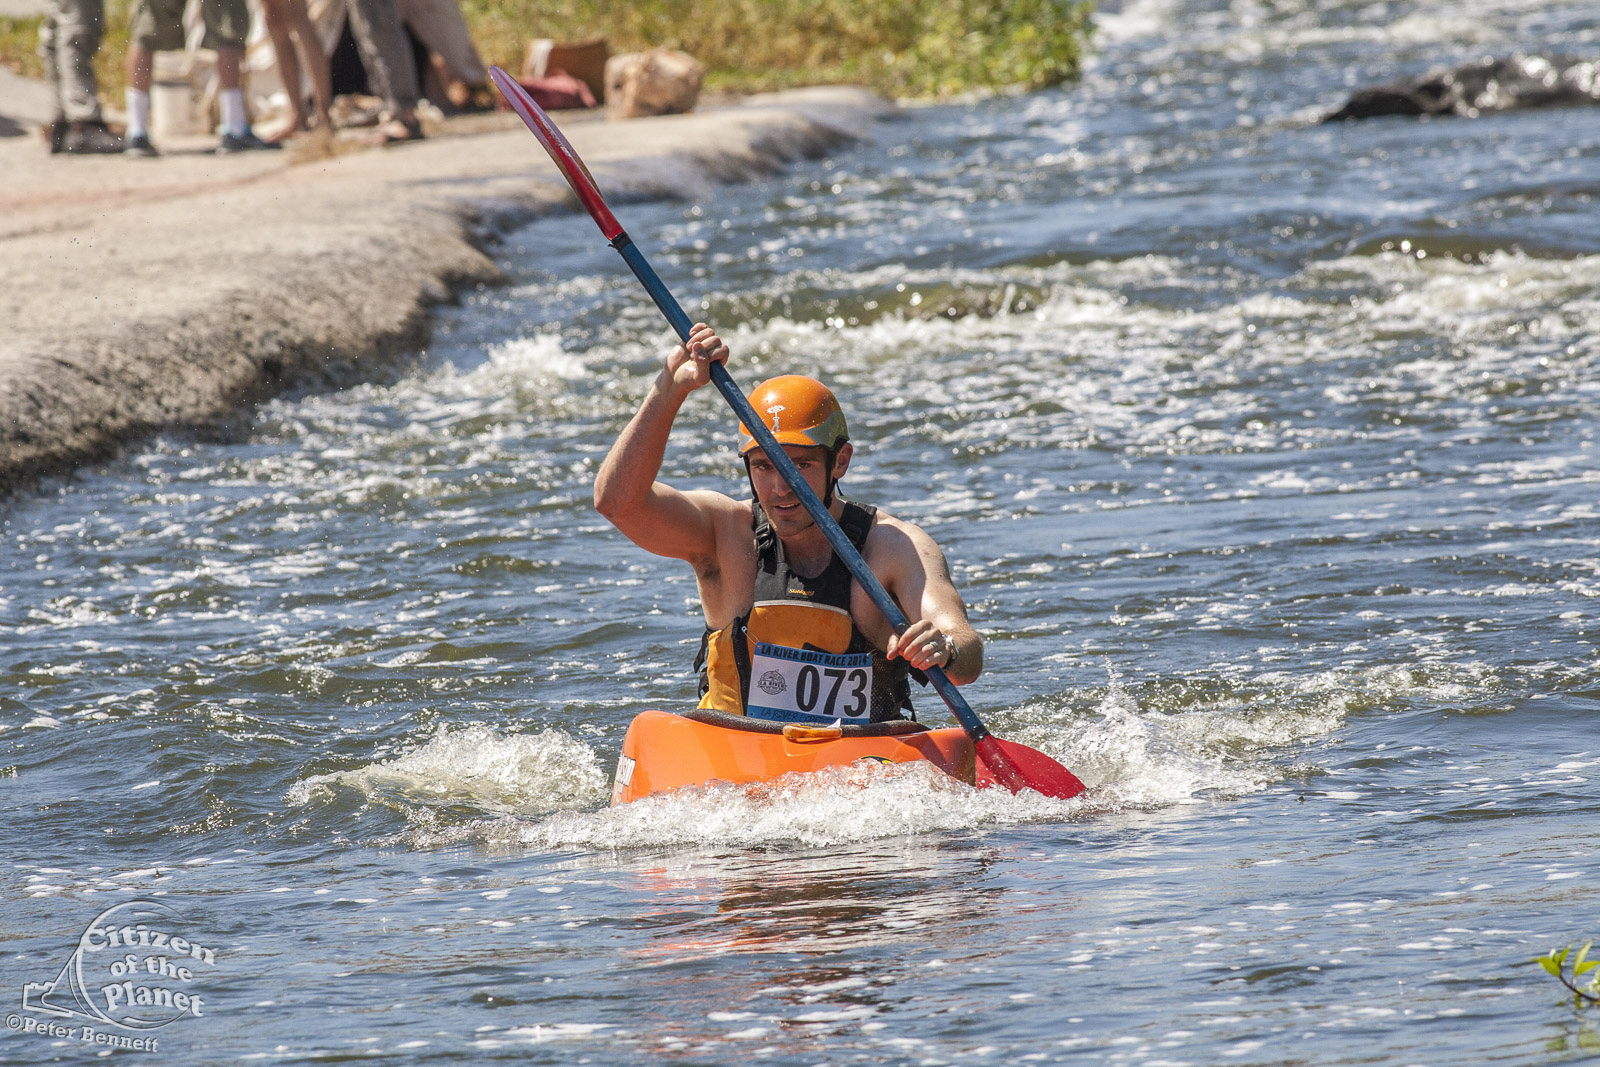 US_CA_48_3886_la_river_boat_race.jpg